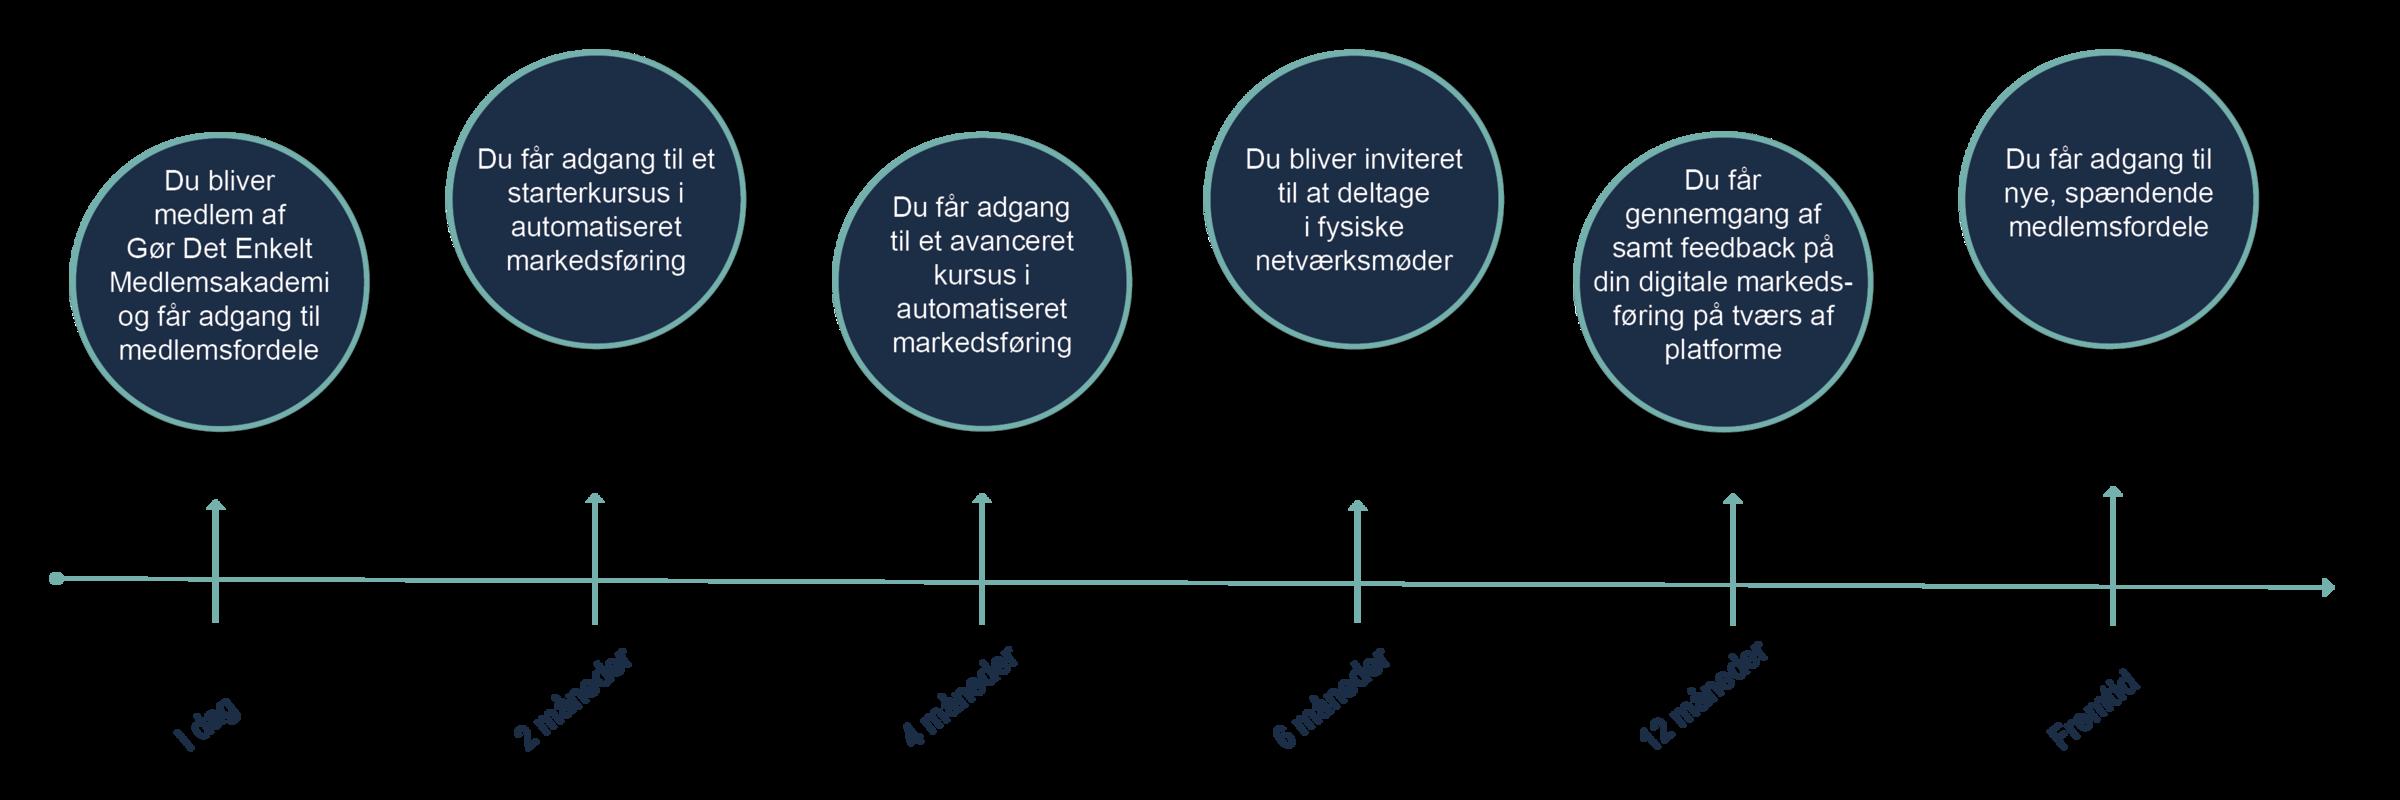 Grafik til Loyalitetsprogram